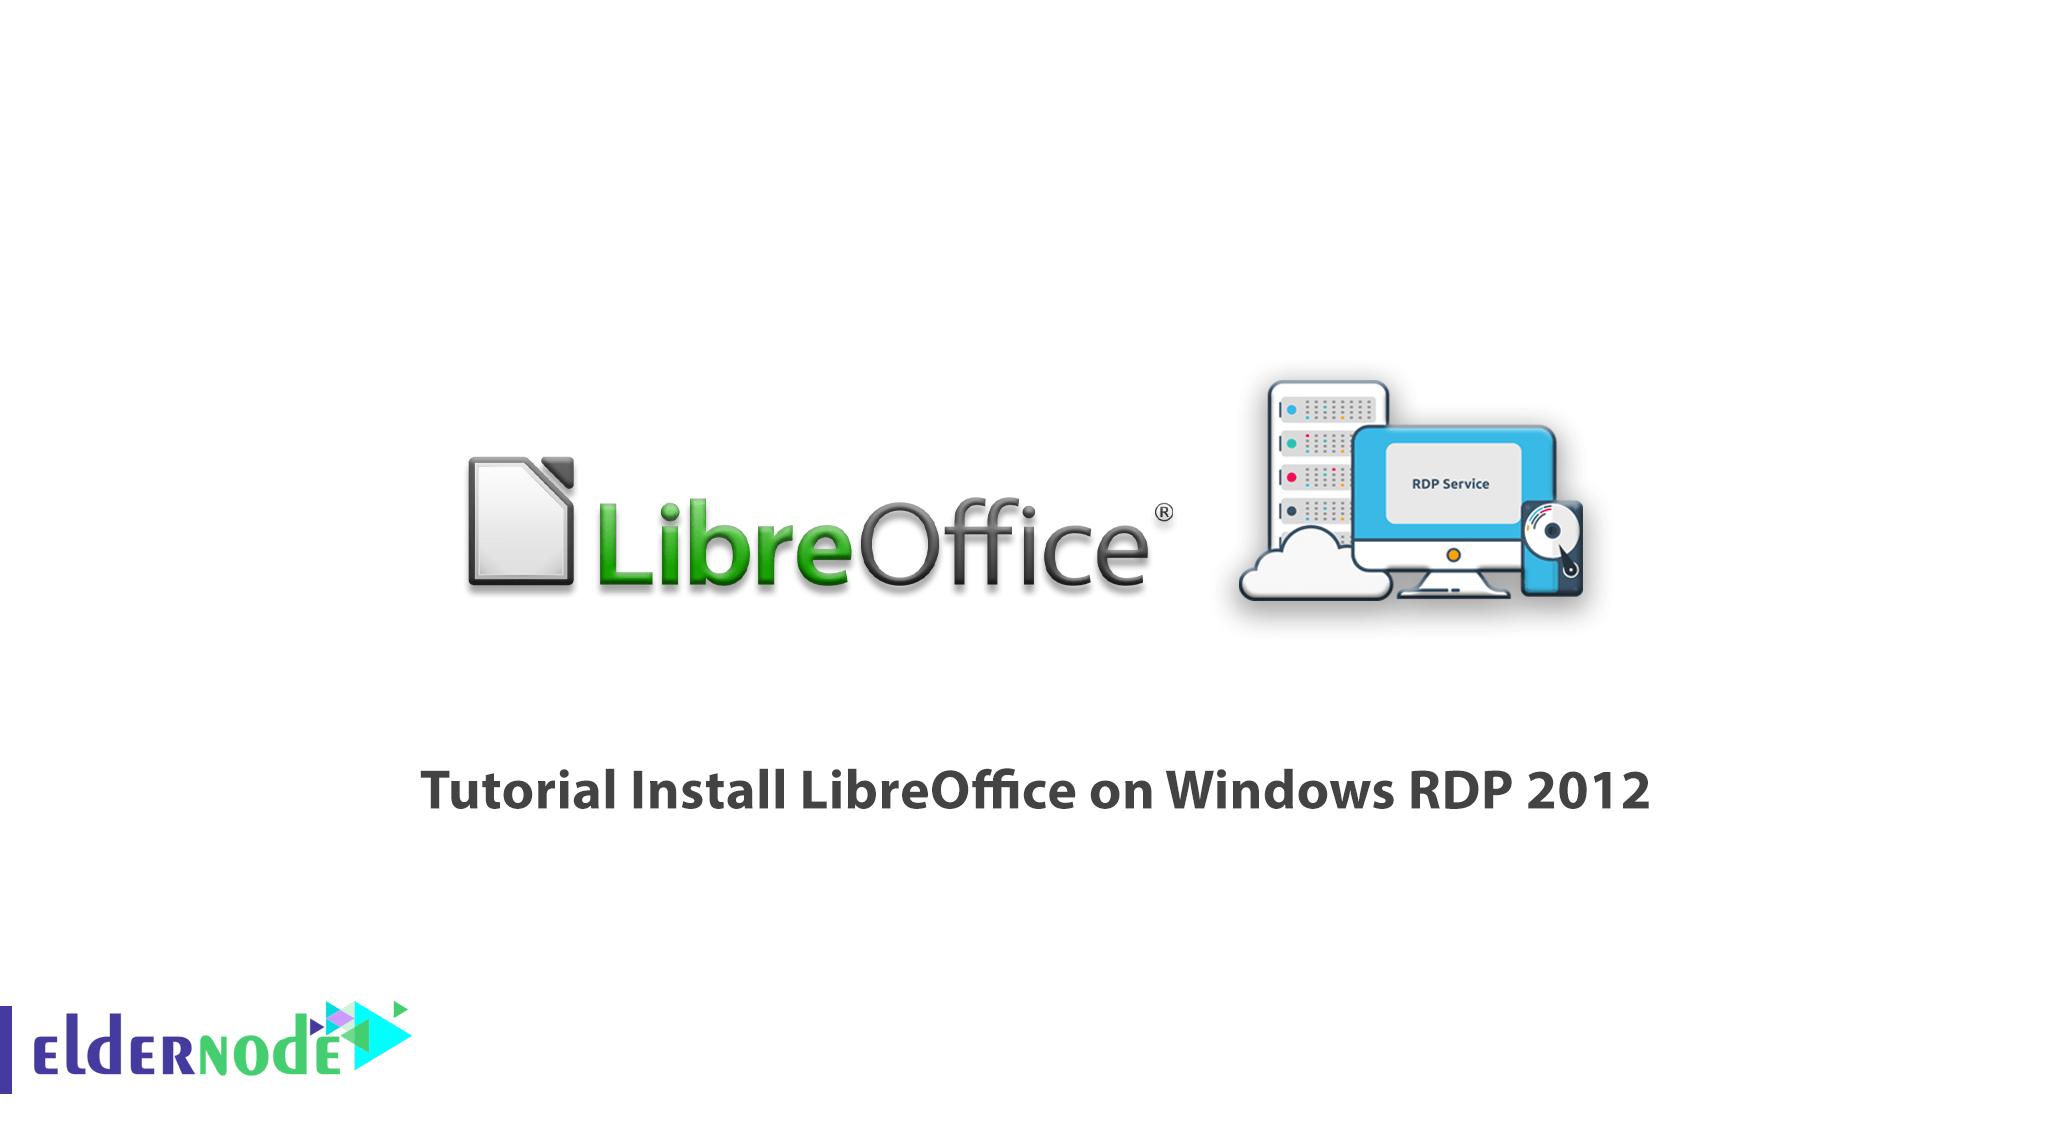 Tutorial Install LibreOffice on Windows RDP 2012